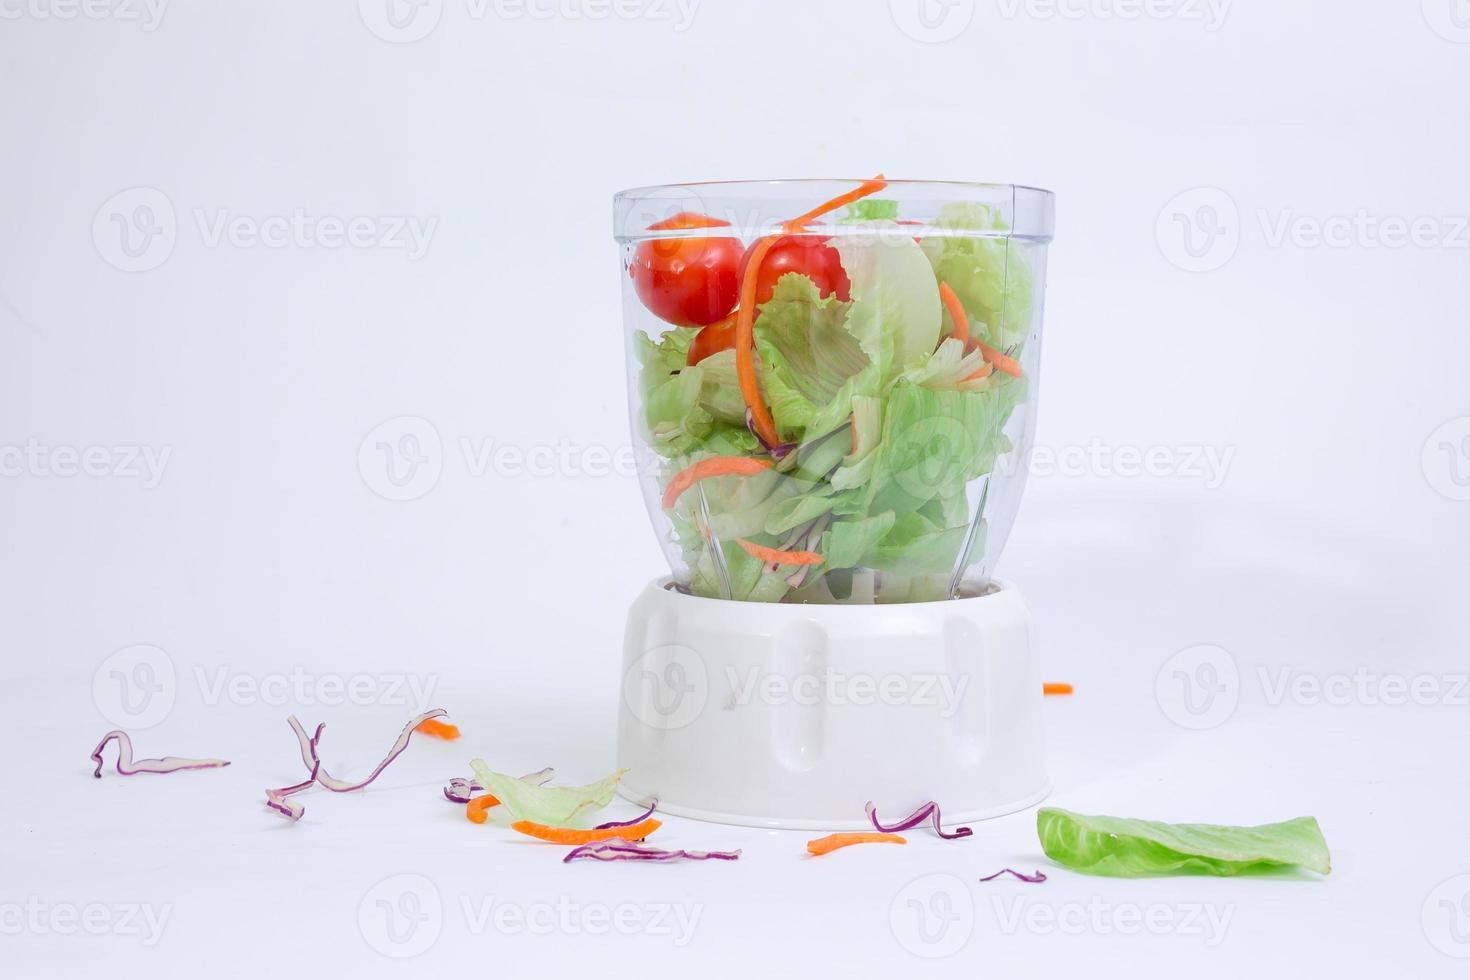 blandad sallad i snurrkopp foto